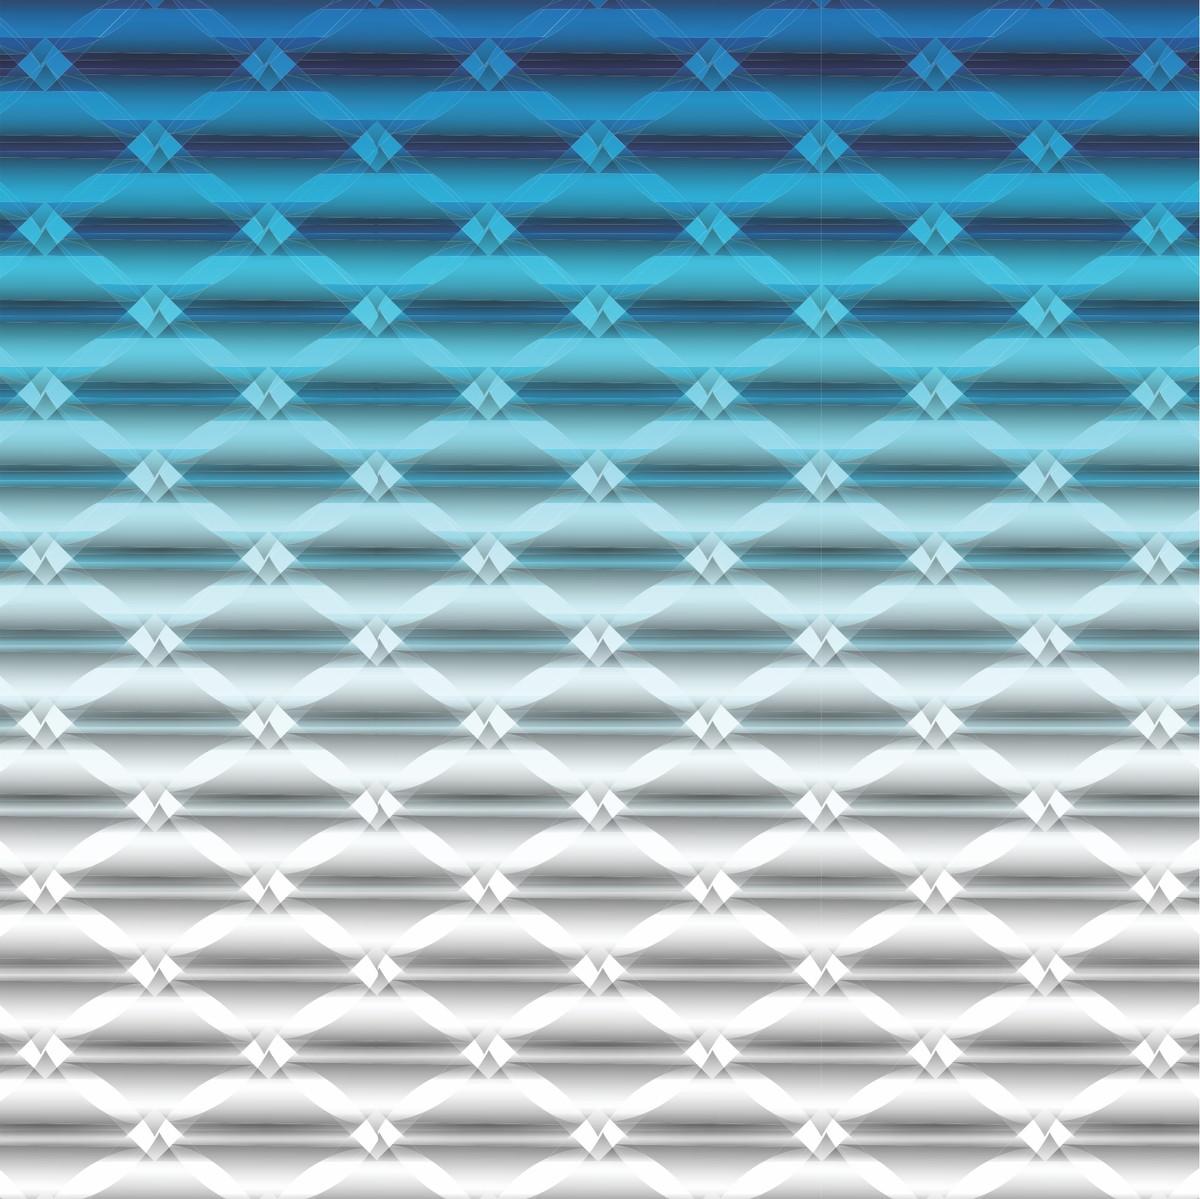 Papel De Parede Adesivo Ou Cola ~ Adesivo Papel de Parede Geométrico Azul Degrad u00ea Cola Mais Adesivos Elo7